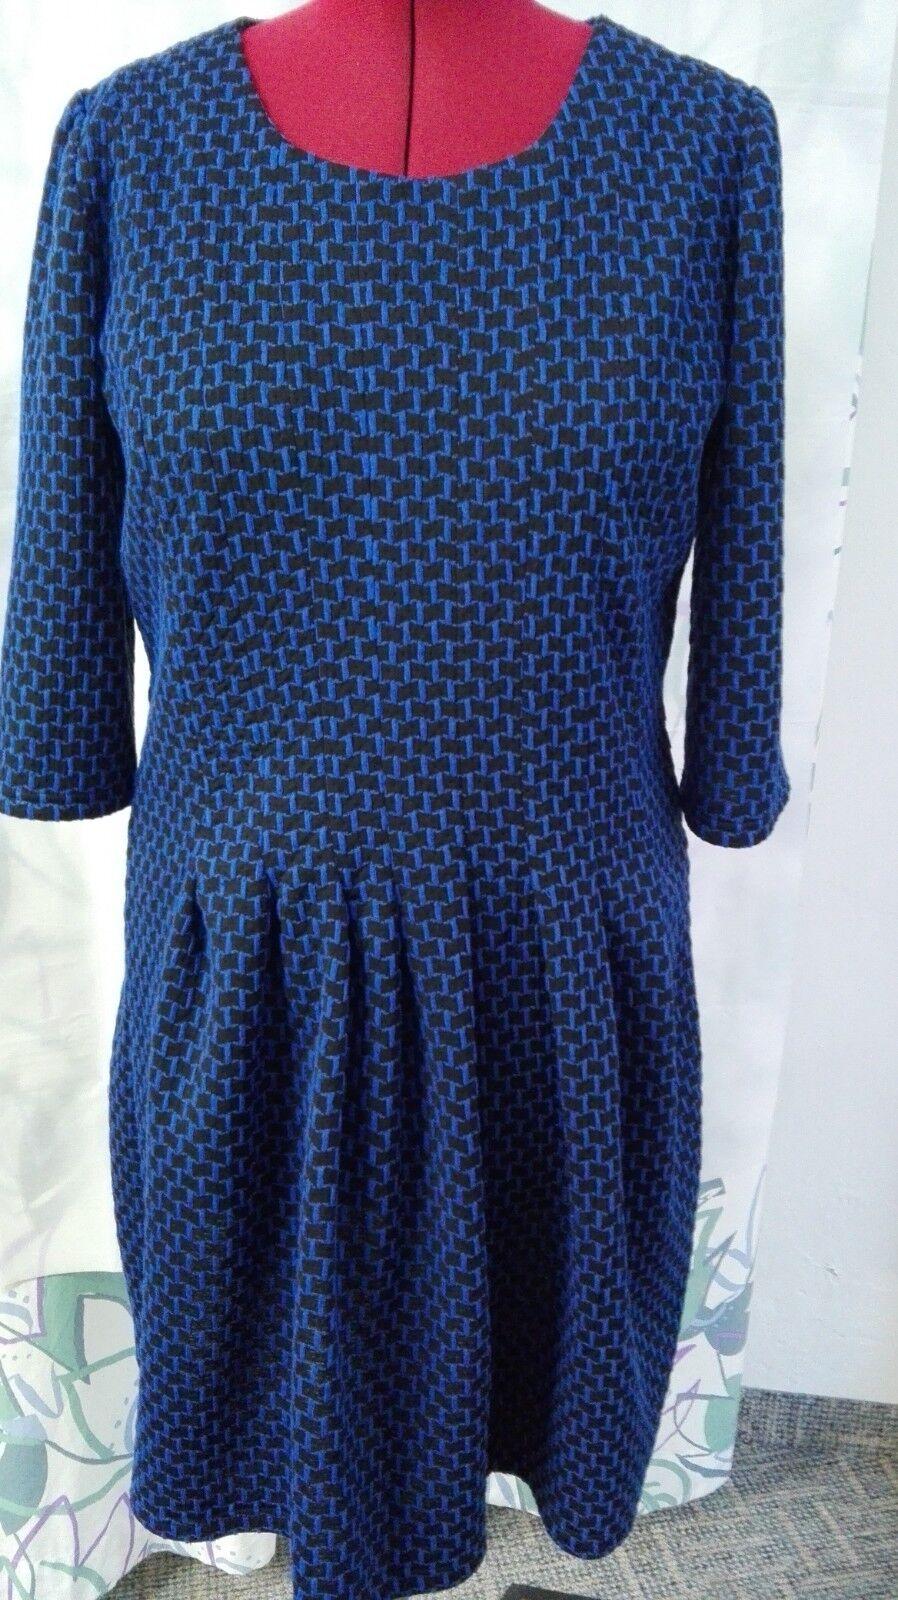 Damen Tunika Jersey 3 4 Lang Lang Lang Ärmel gr.48-50 | Verrückter Preis  | Elegant Und Würdevoll  | Preisreduktion  2f17f1